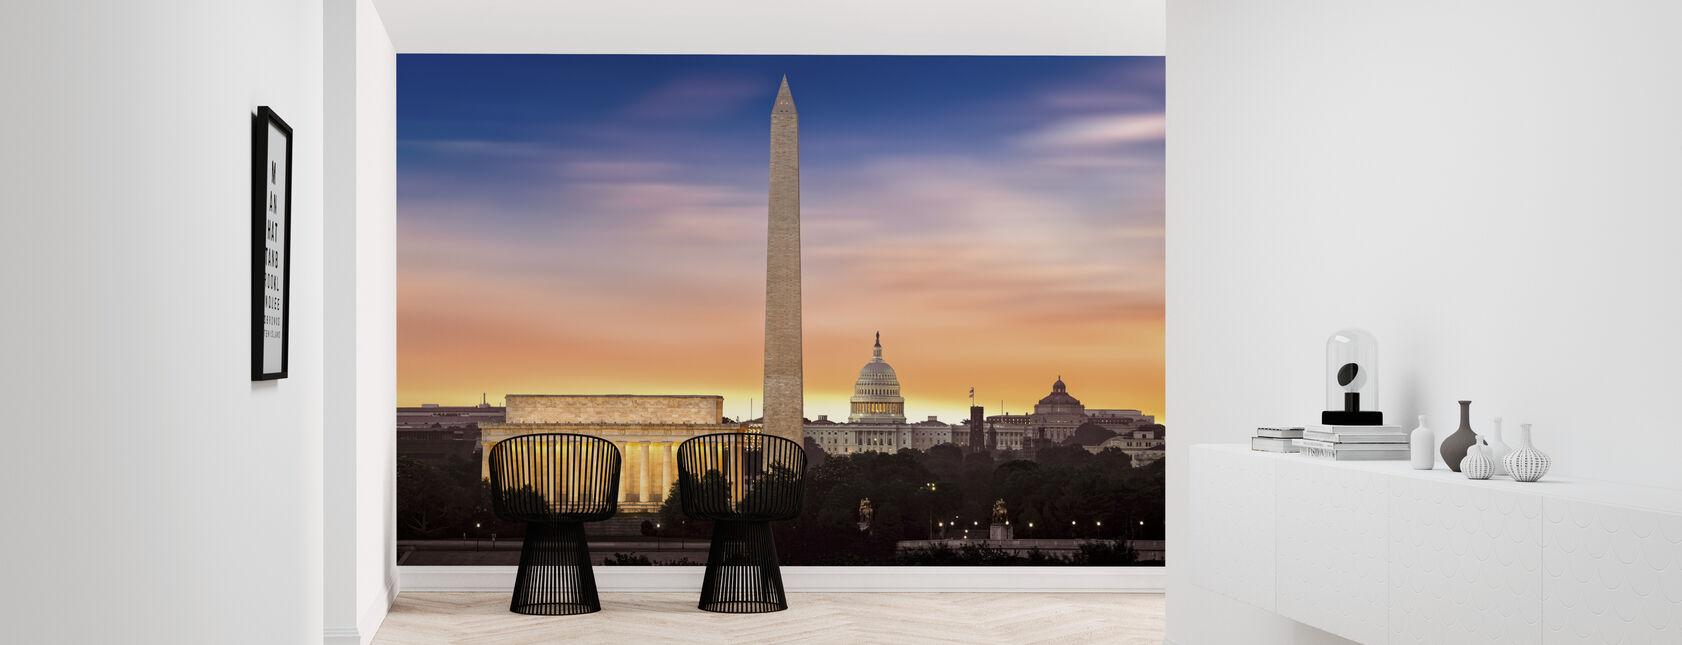 Dawn at Washington Monument - Wallpaper - Hallway